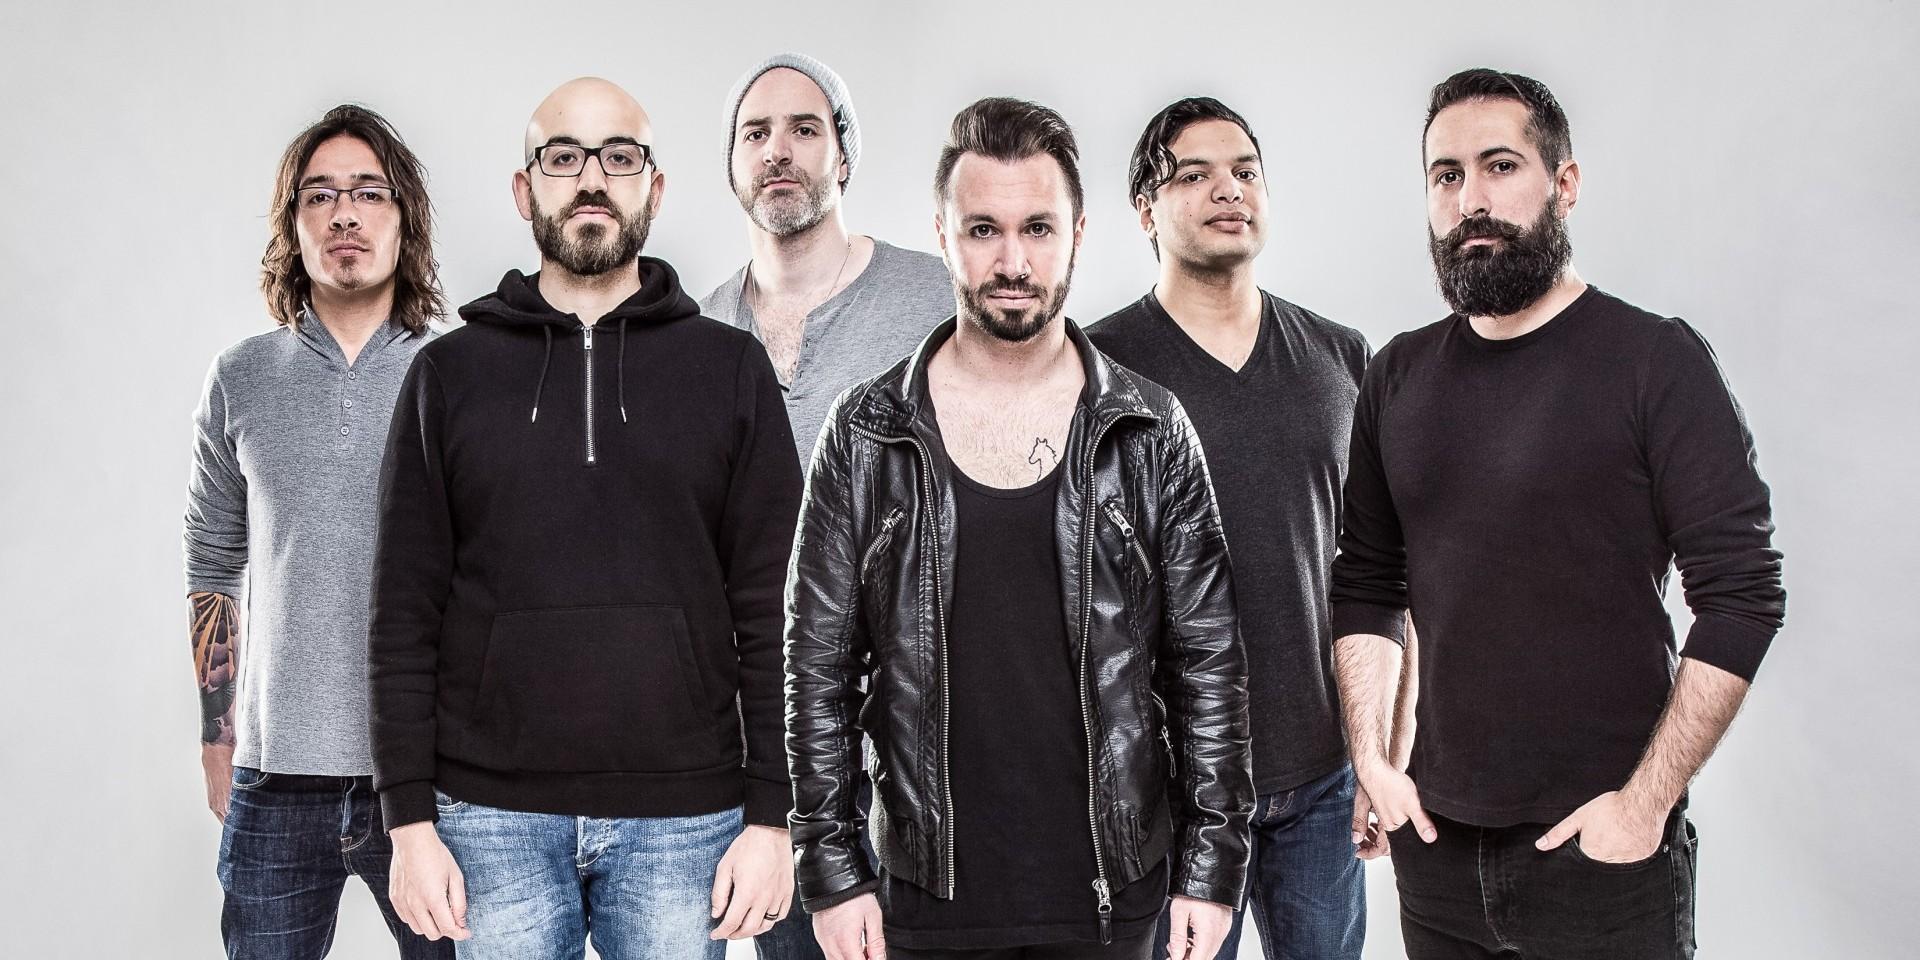 Prog metal giants Periphery to make Singapore debut